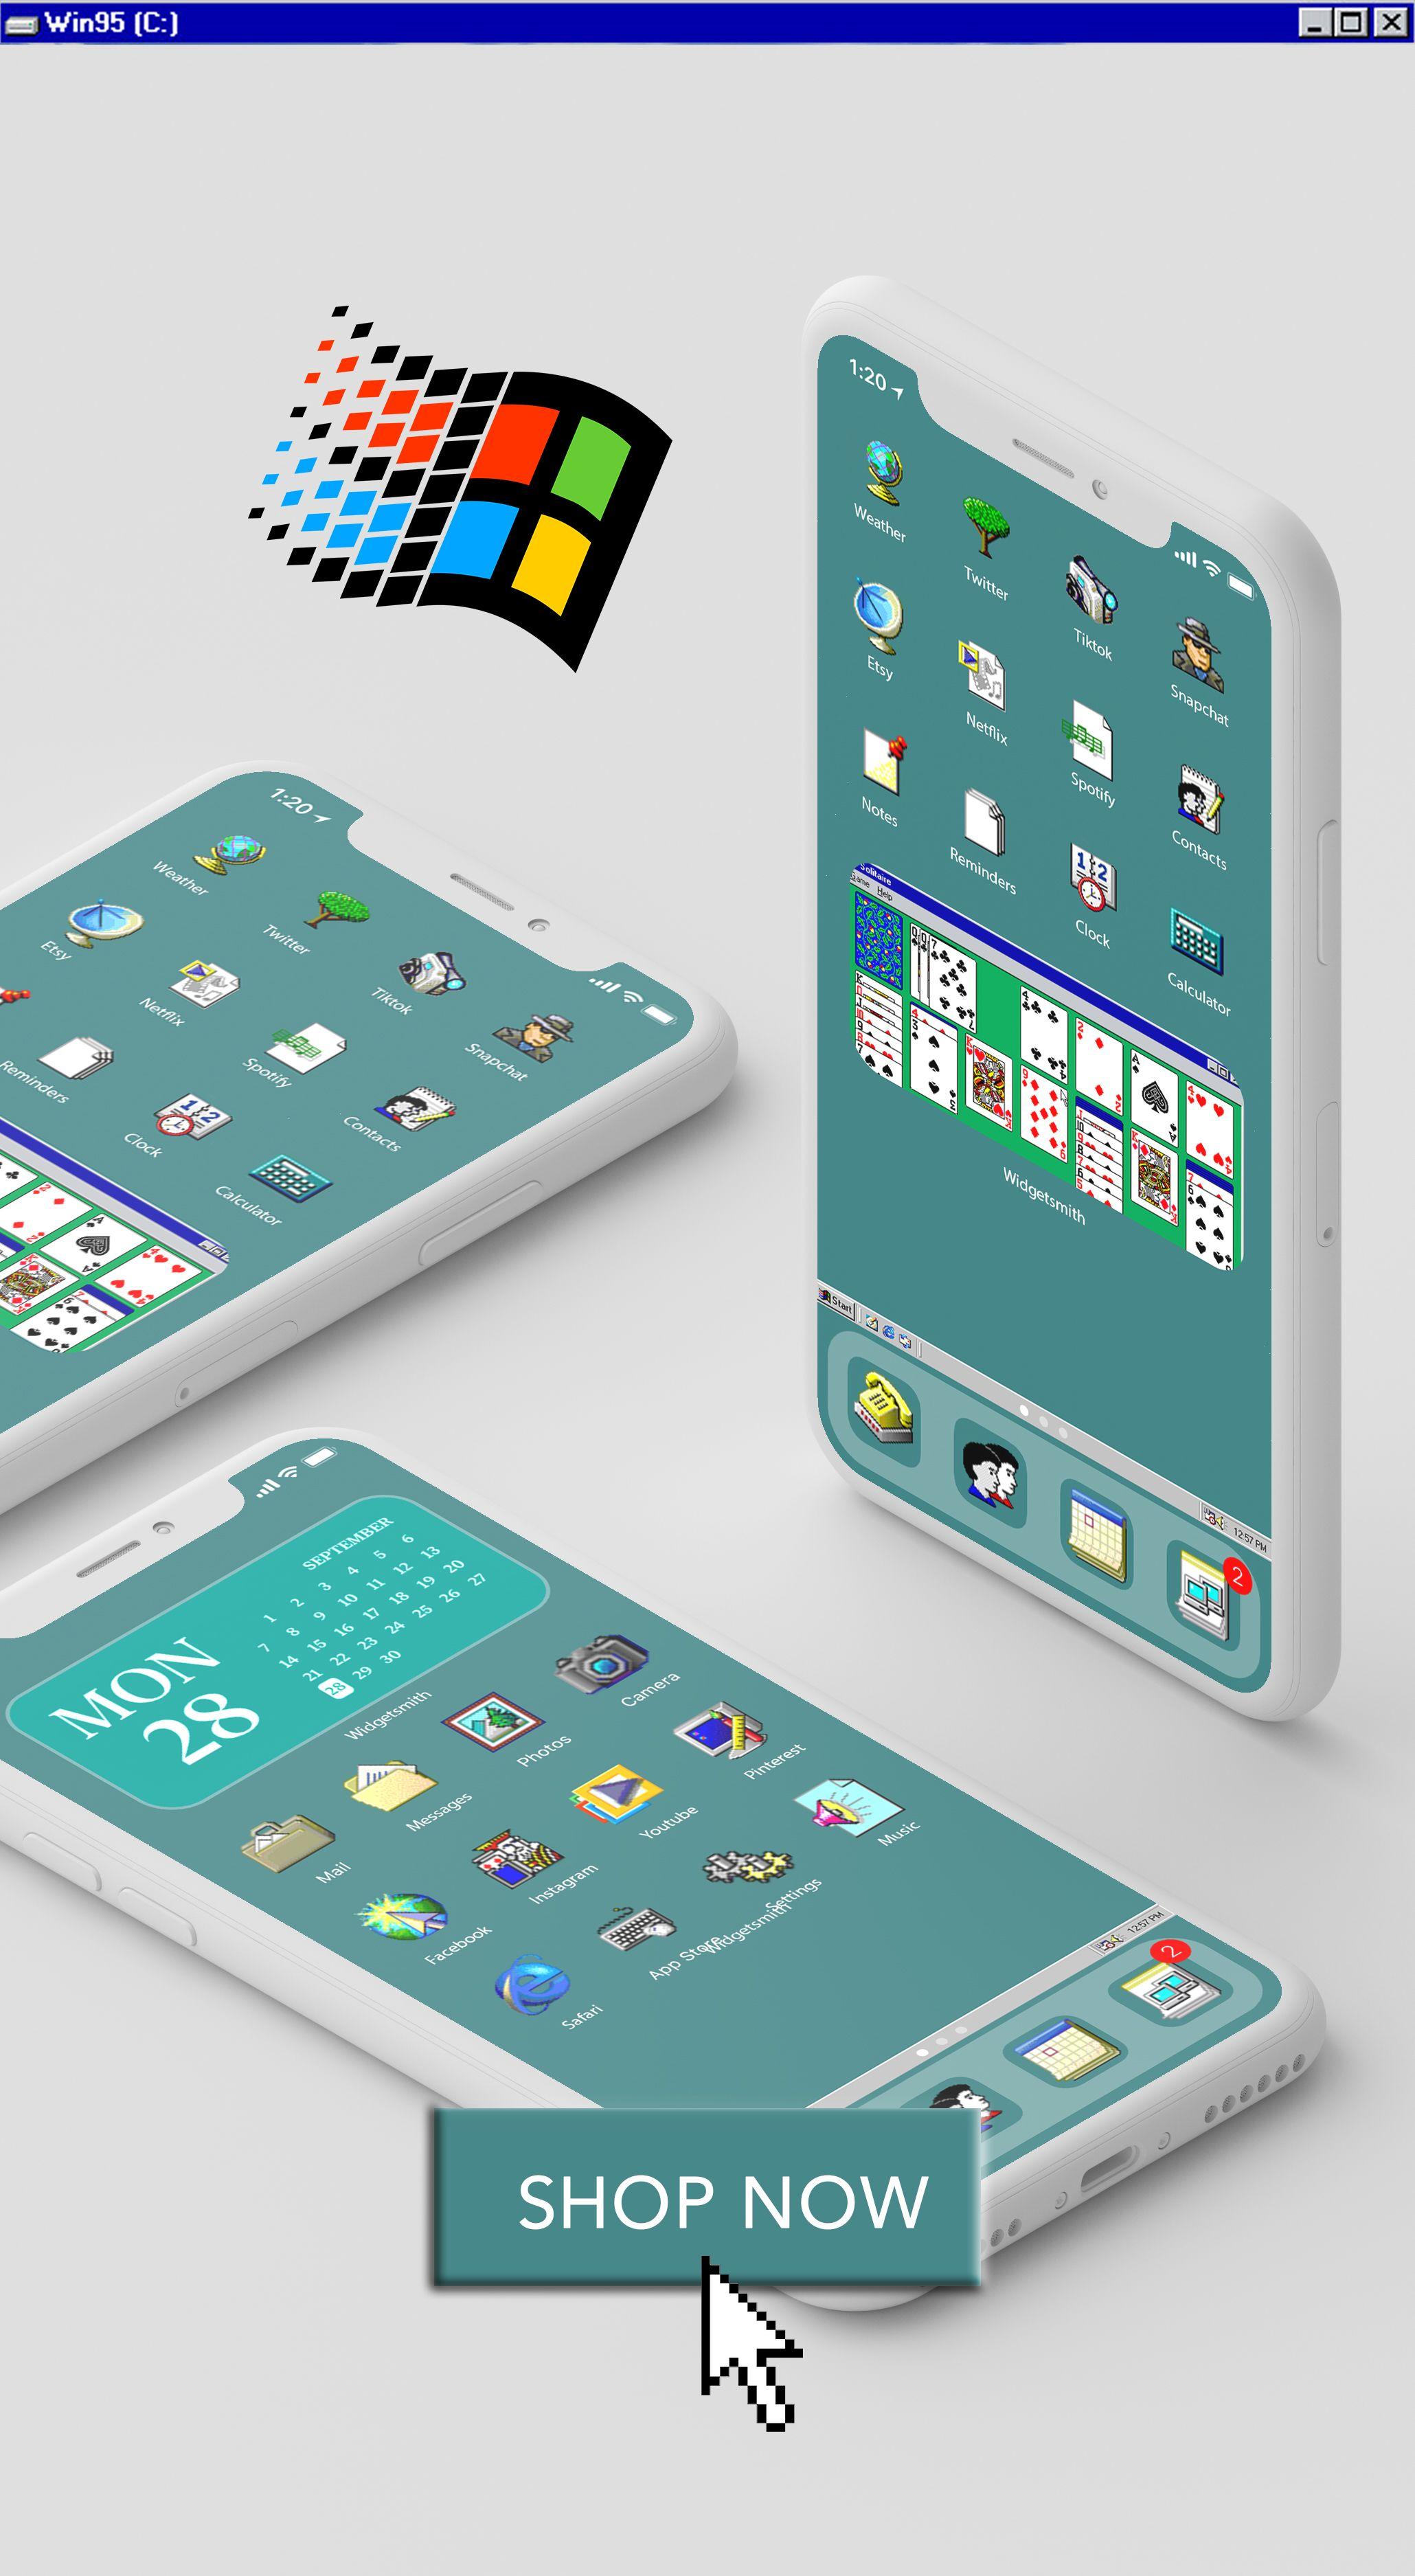 28 Iphone Ios 14 App Icons Ios14 Widget Photos Windows95 Etsy In 2020 App Icon Iphone Shortcut Icon